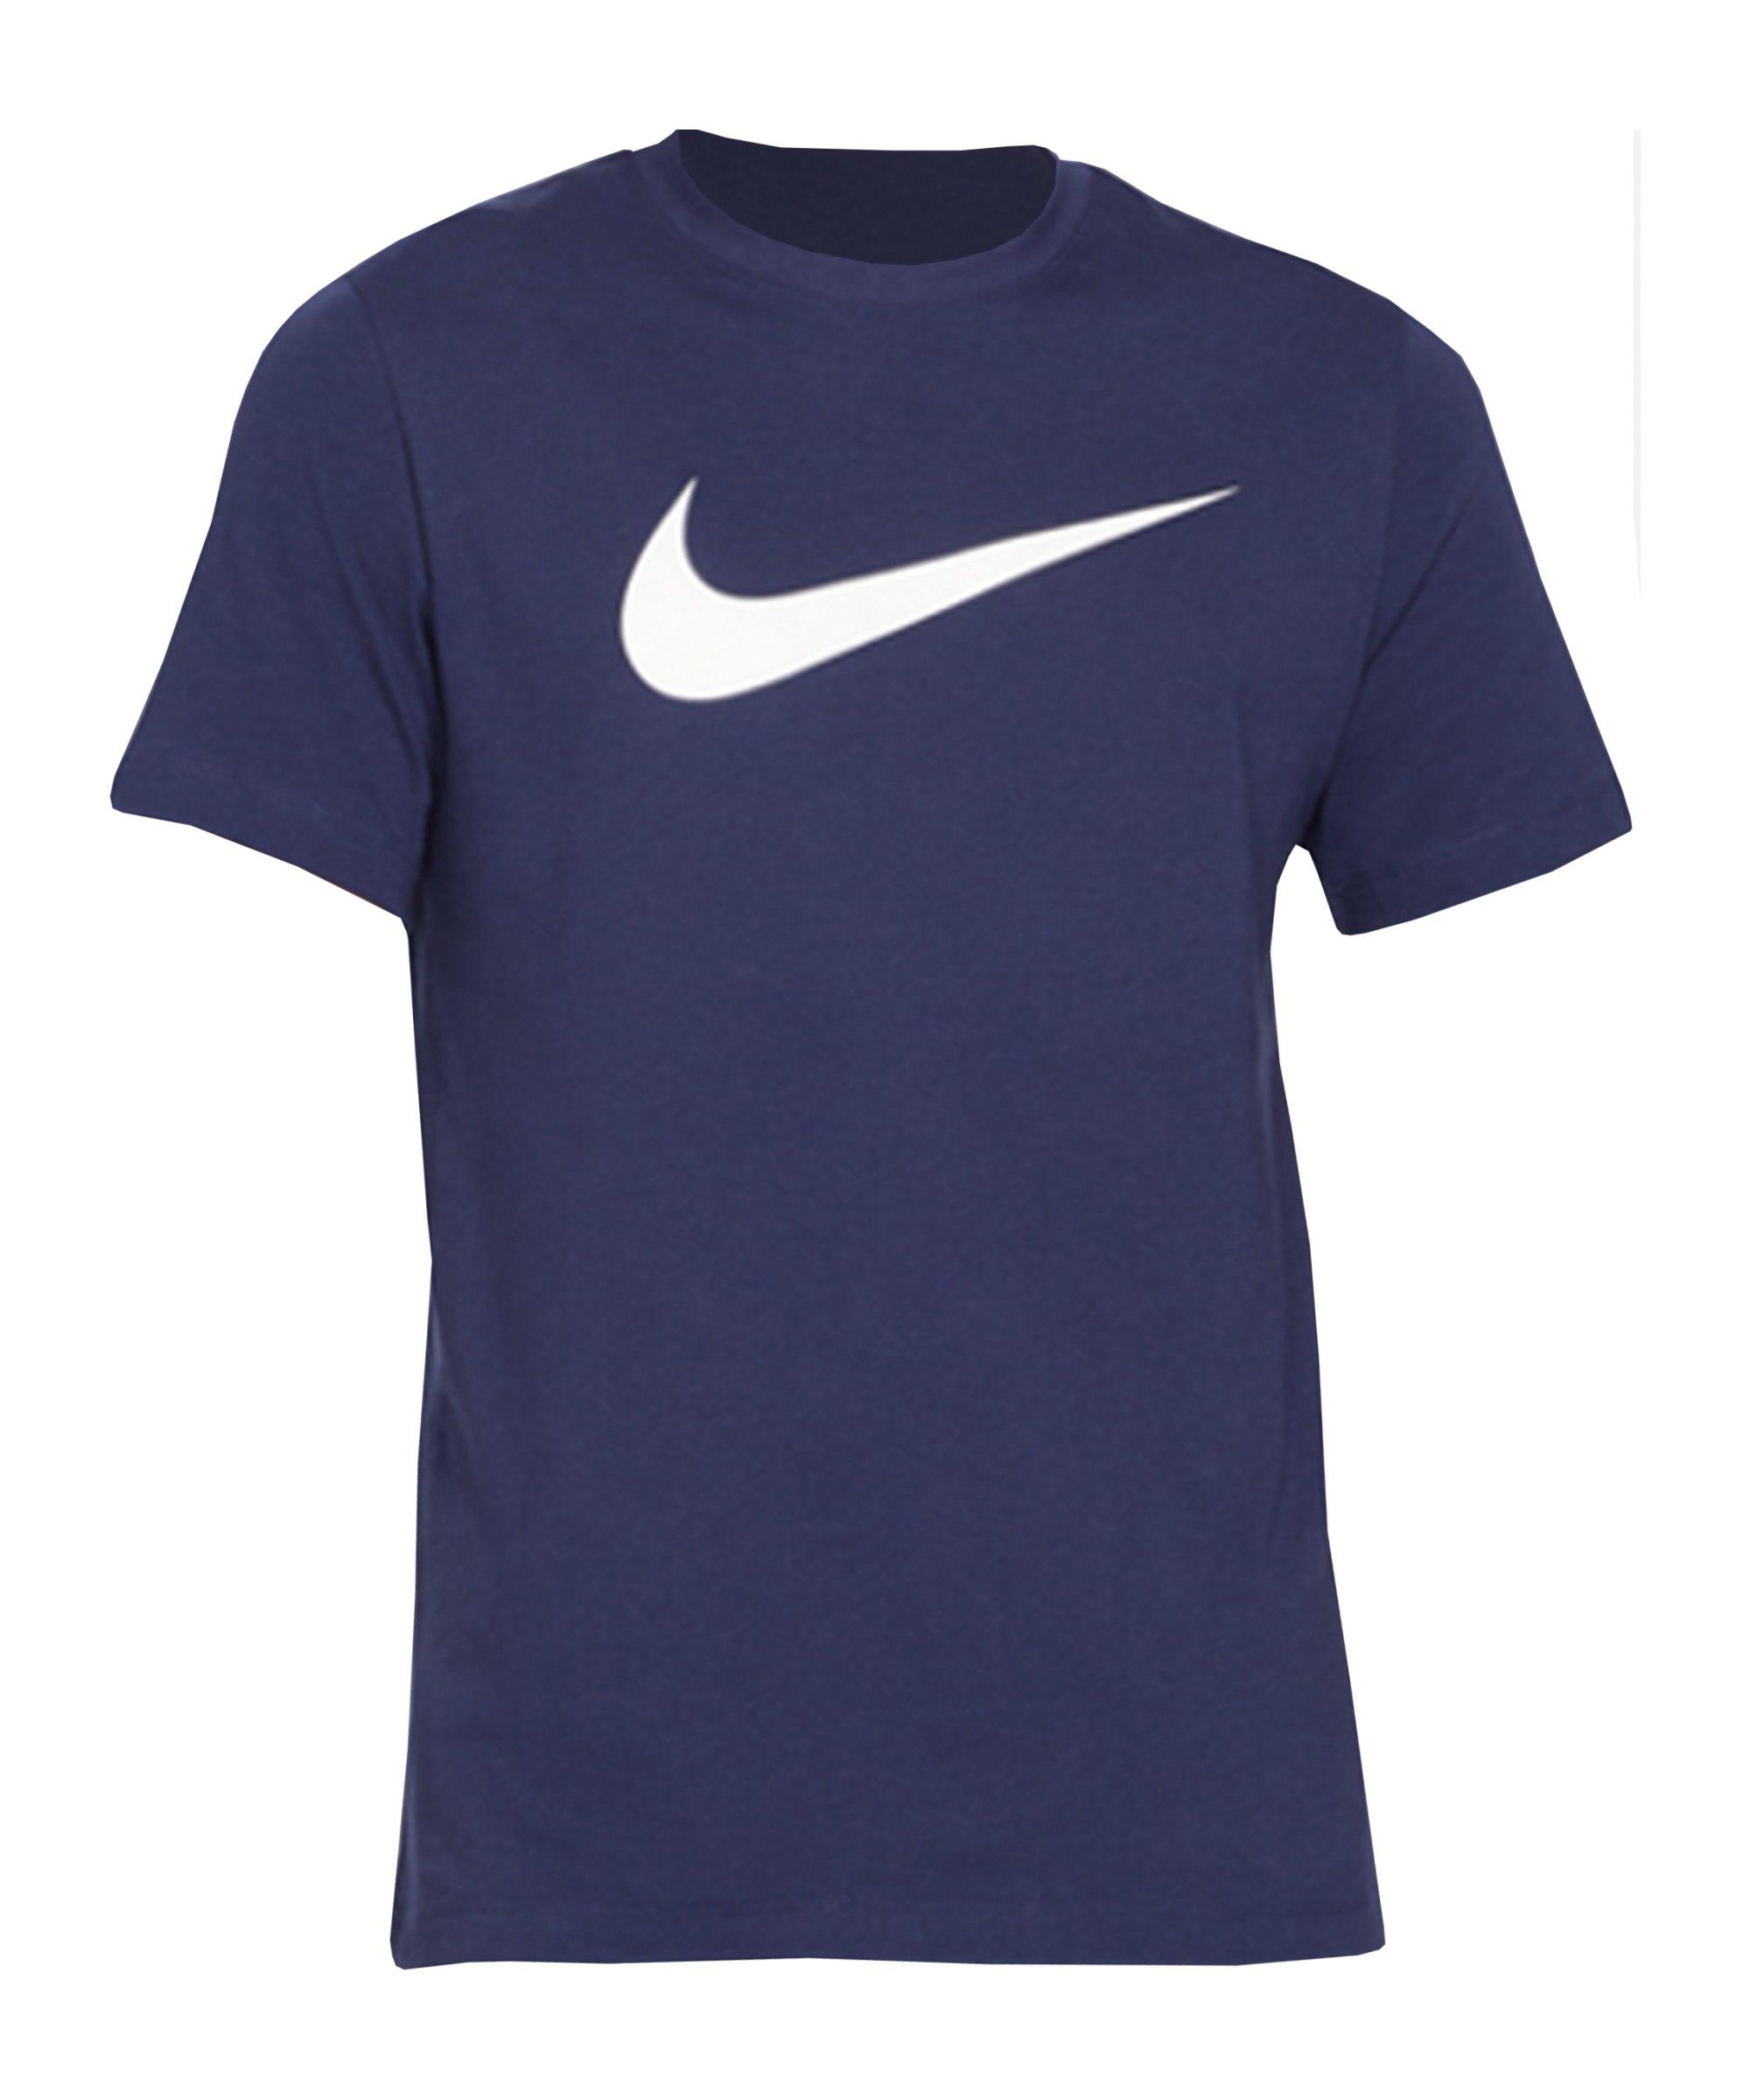 Nike Swoosh T-Shirt Blau Weiss F410 - blau